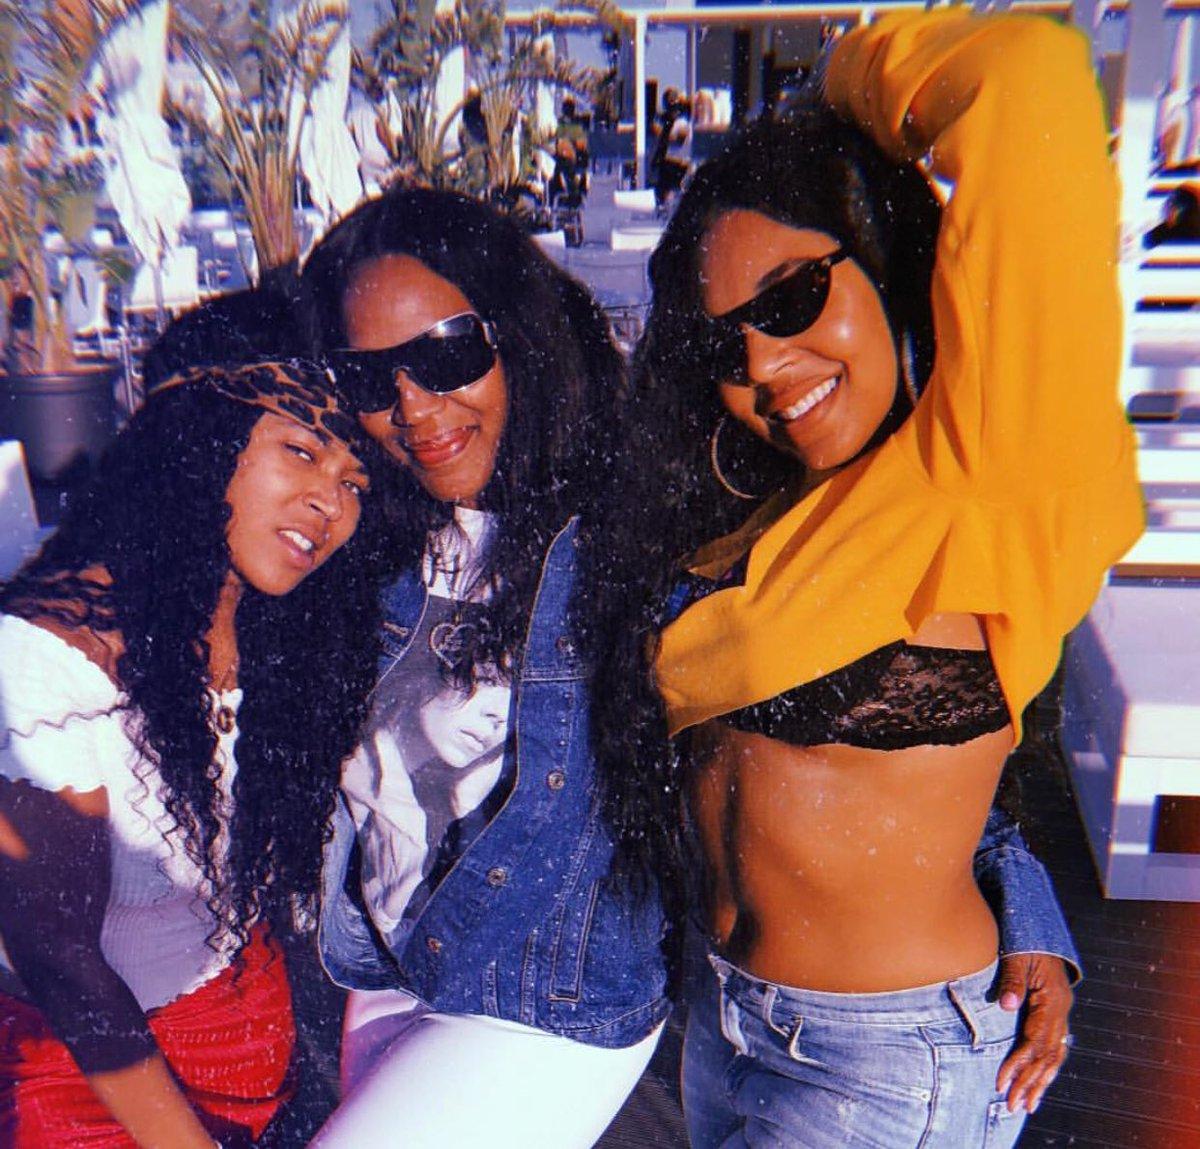 RT @ashantixtra: #Malta sun ???? with @ashanti mom & sister #Ashanti #ashantidaily https://t.co/MELFgRIVqO